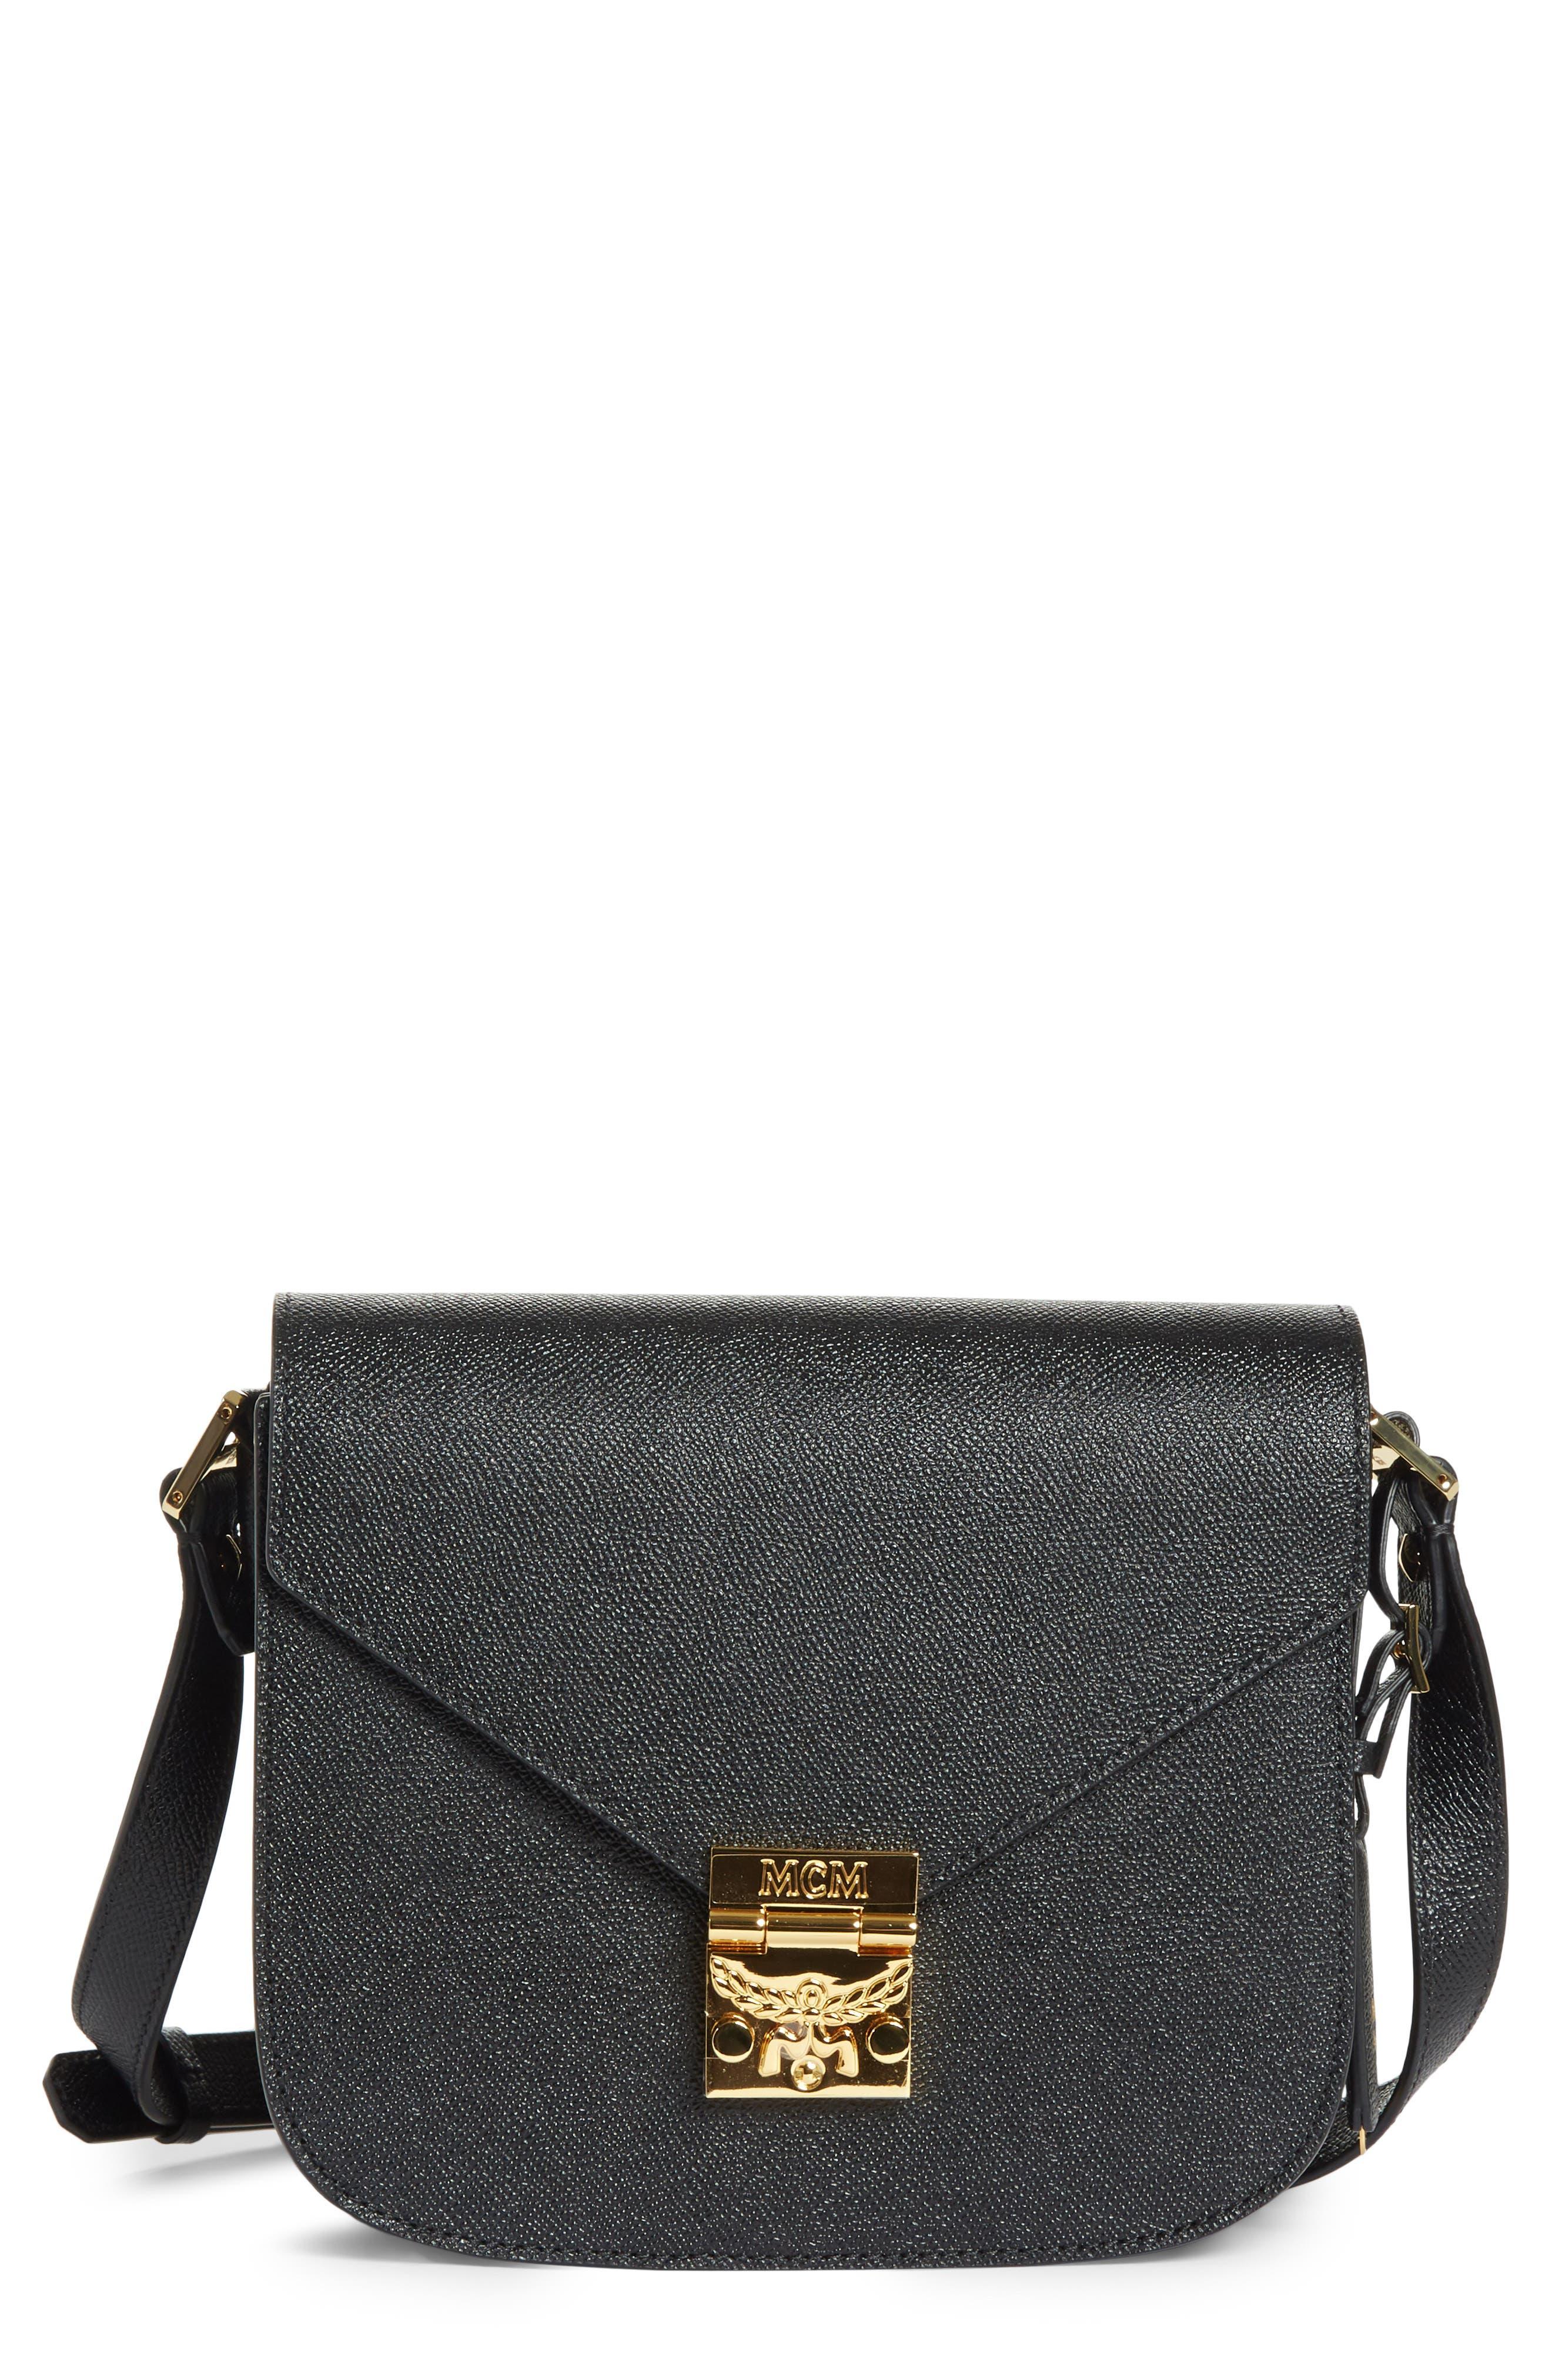 Small RGB Leather Shoulder Bag,                         Main,                         color, BLACK